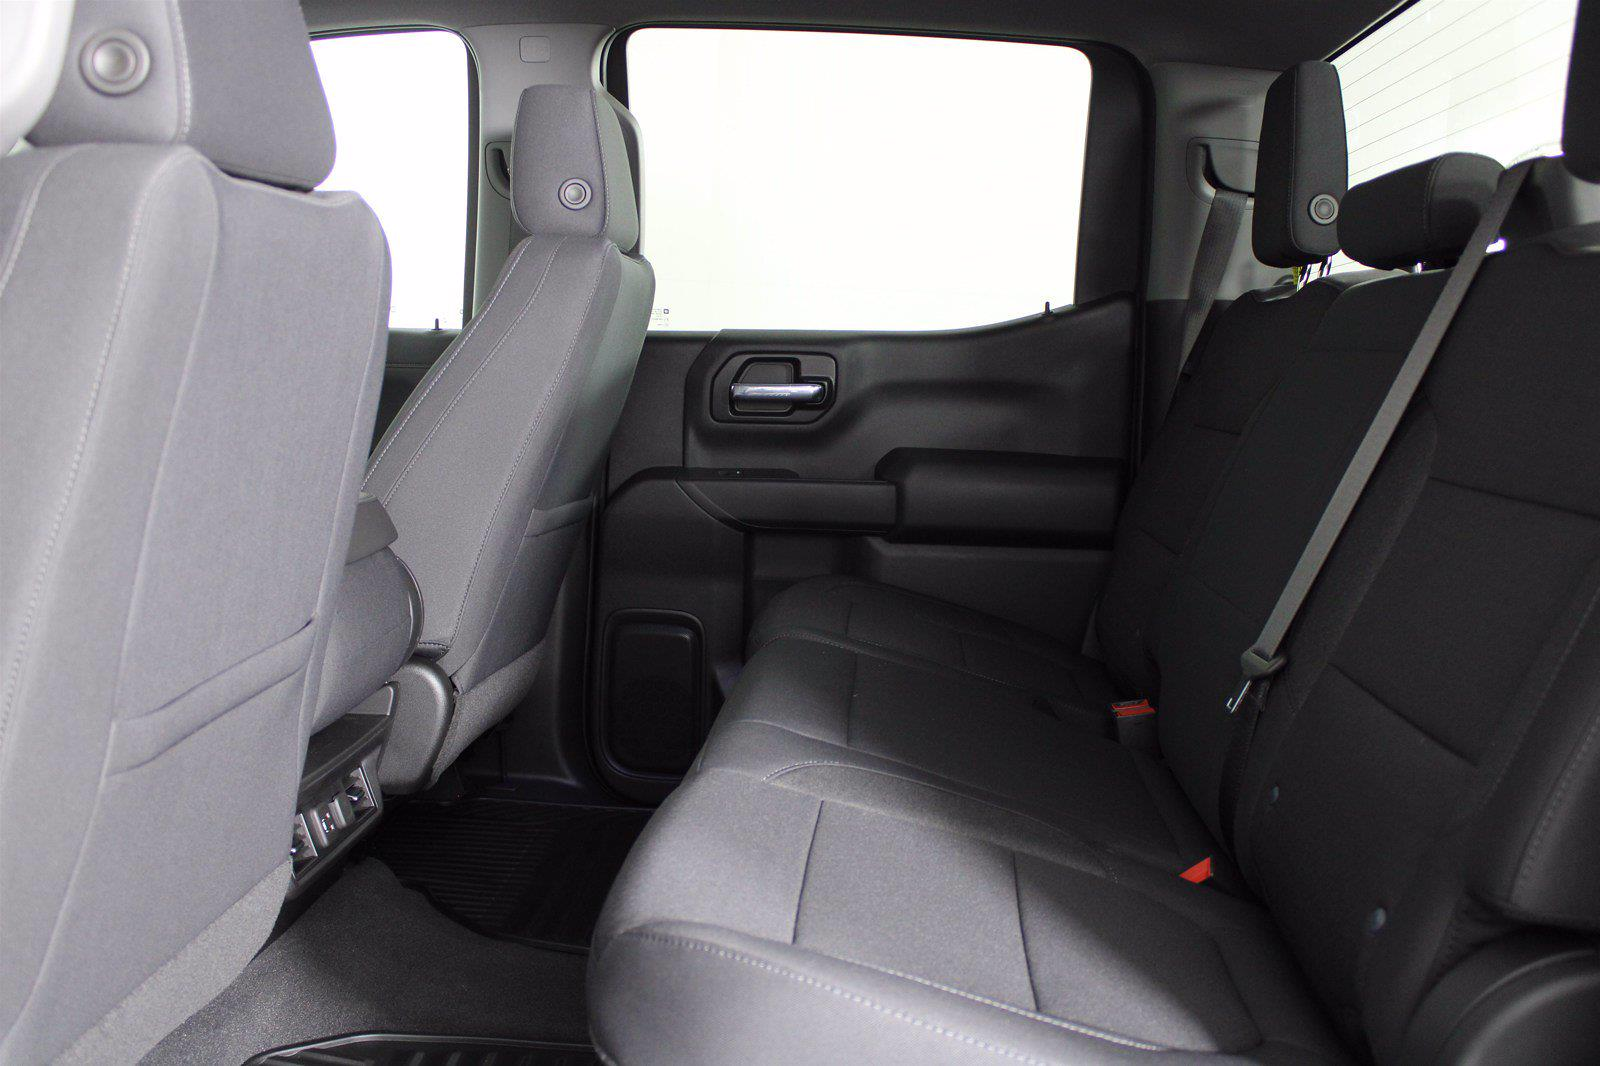 2021 Chevrolet Silverado 1500 Crew Cab 4x4, Pickup #D111136 - photo 16